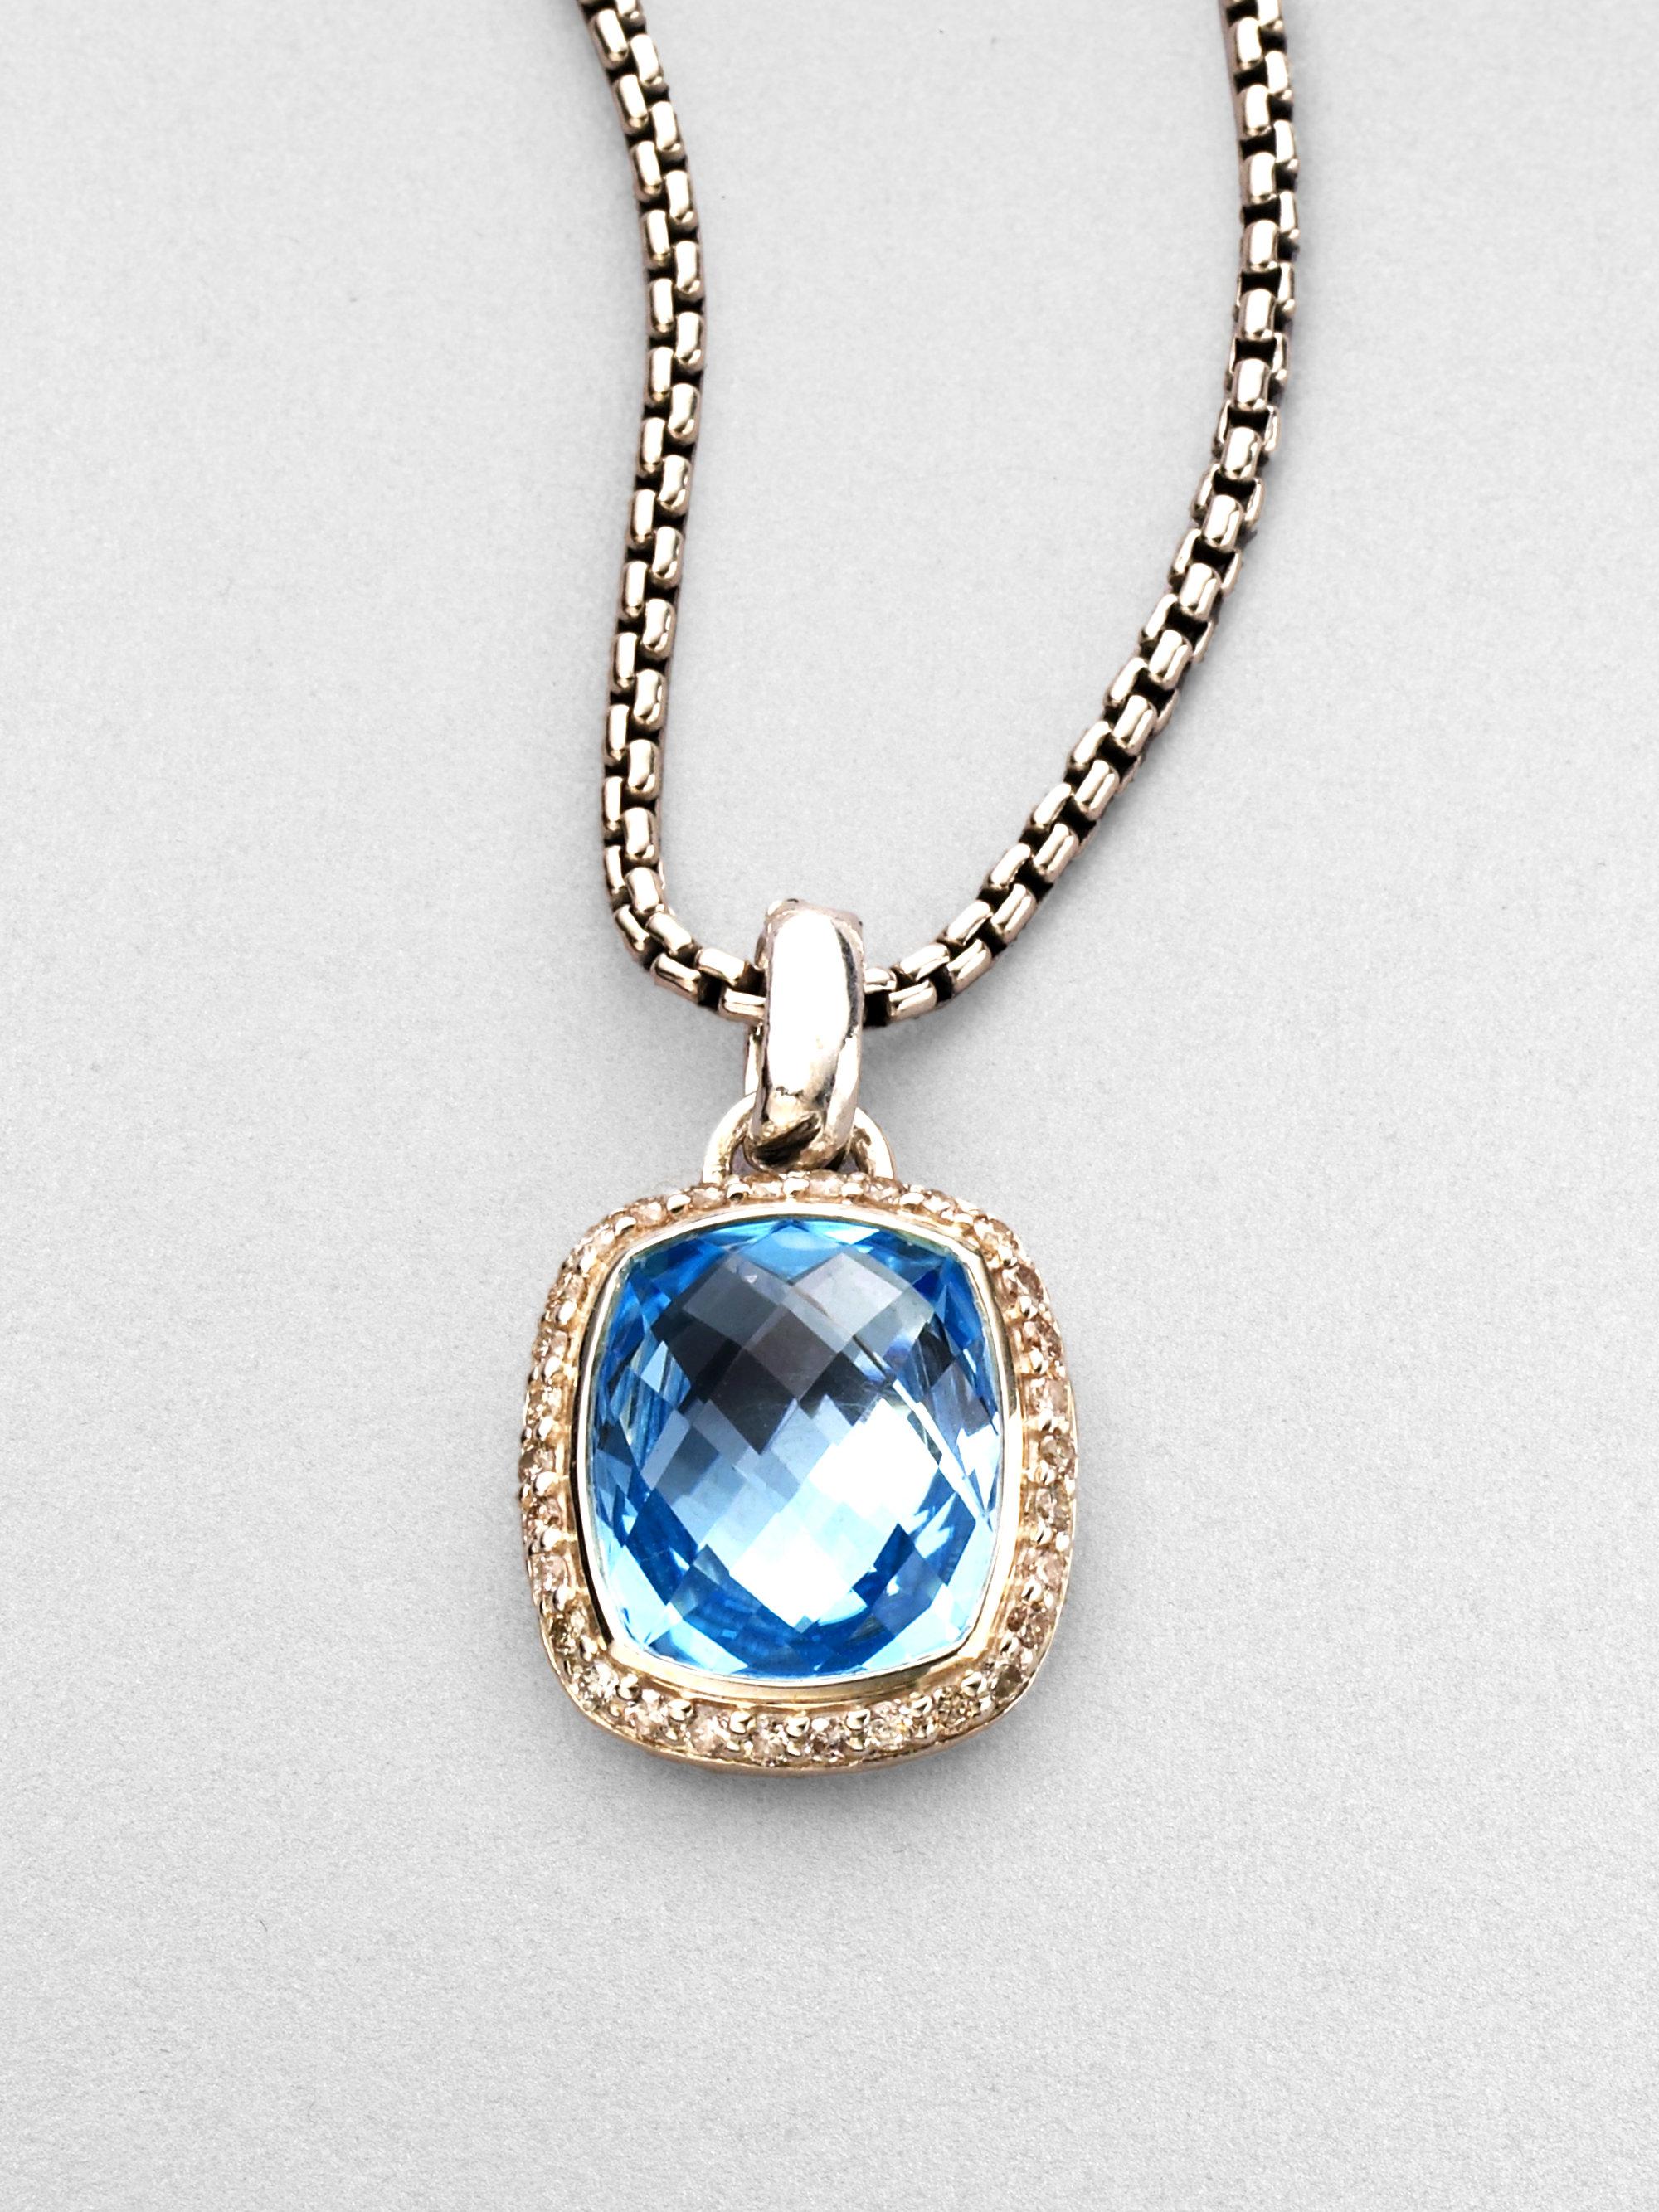 David yurman Blue Topaz Diamond Sterling Silver Necklace in